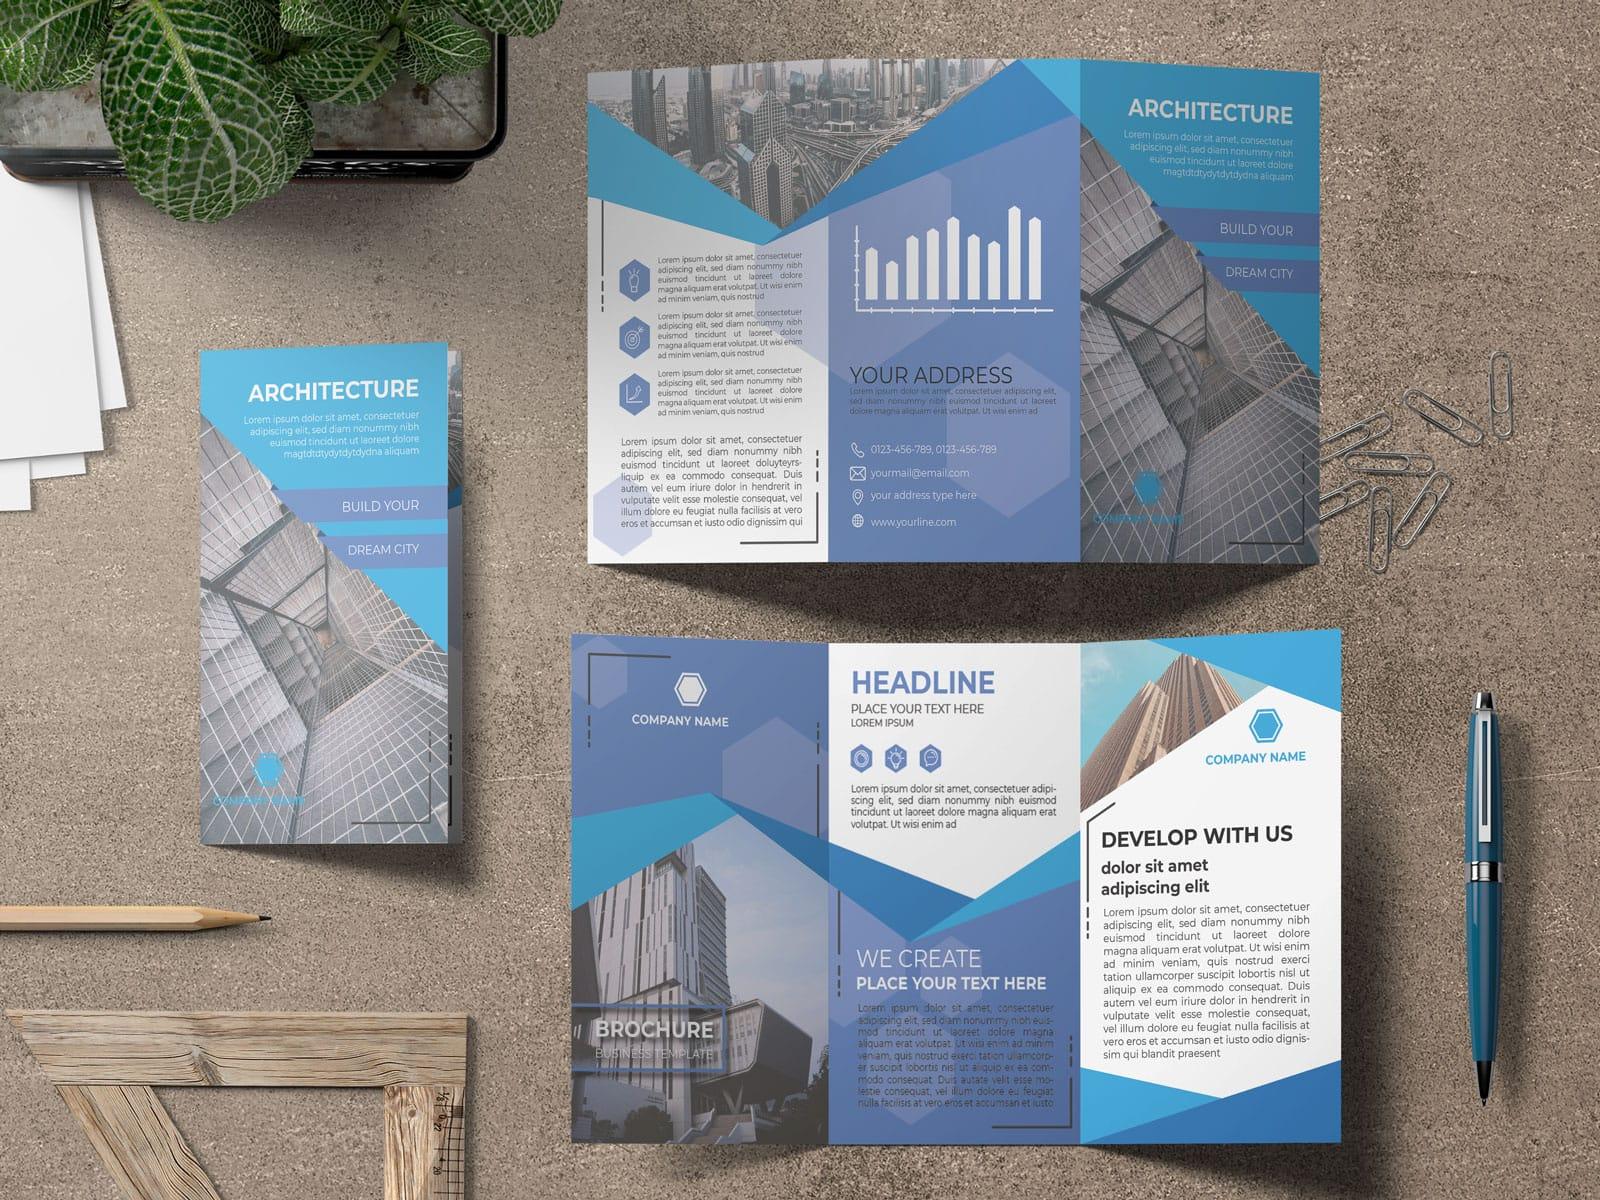 Elegant Architectural Firm Brochure Design